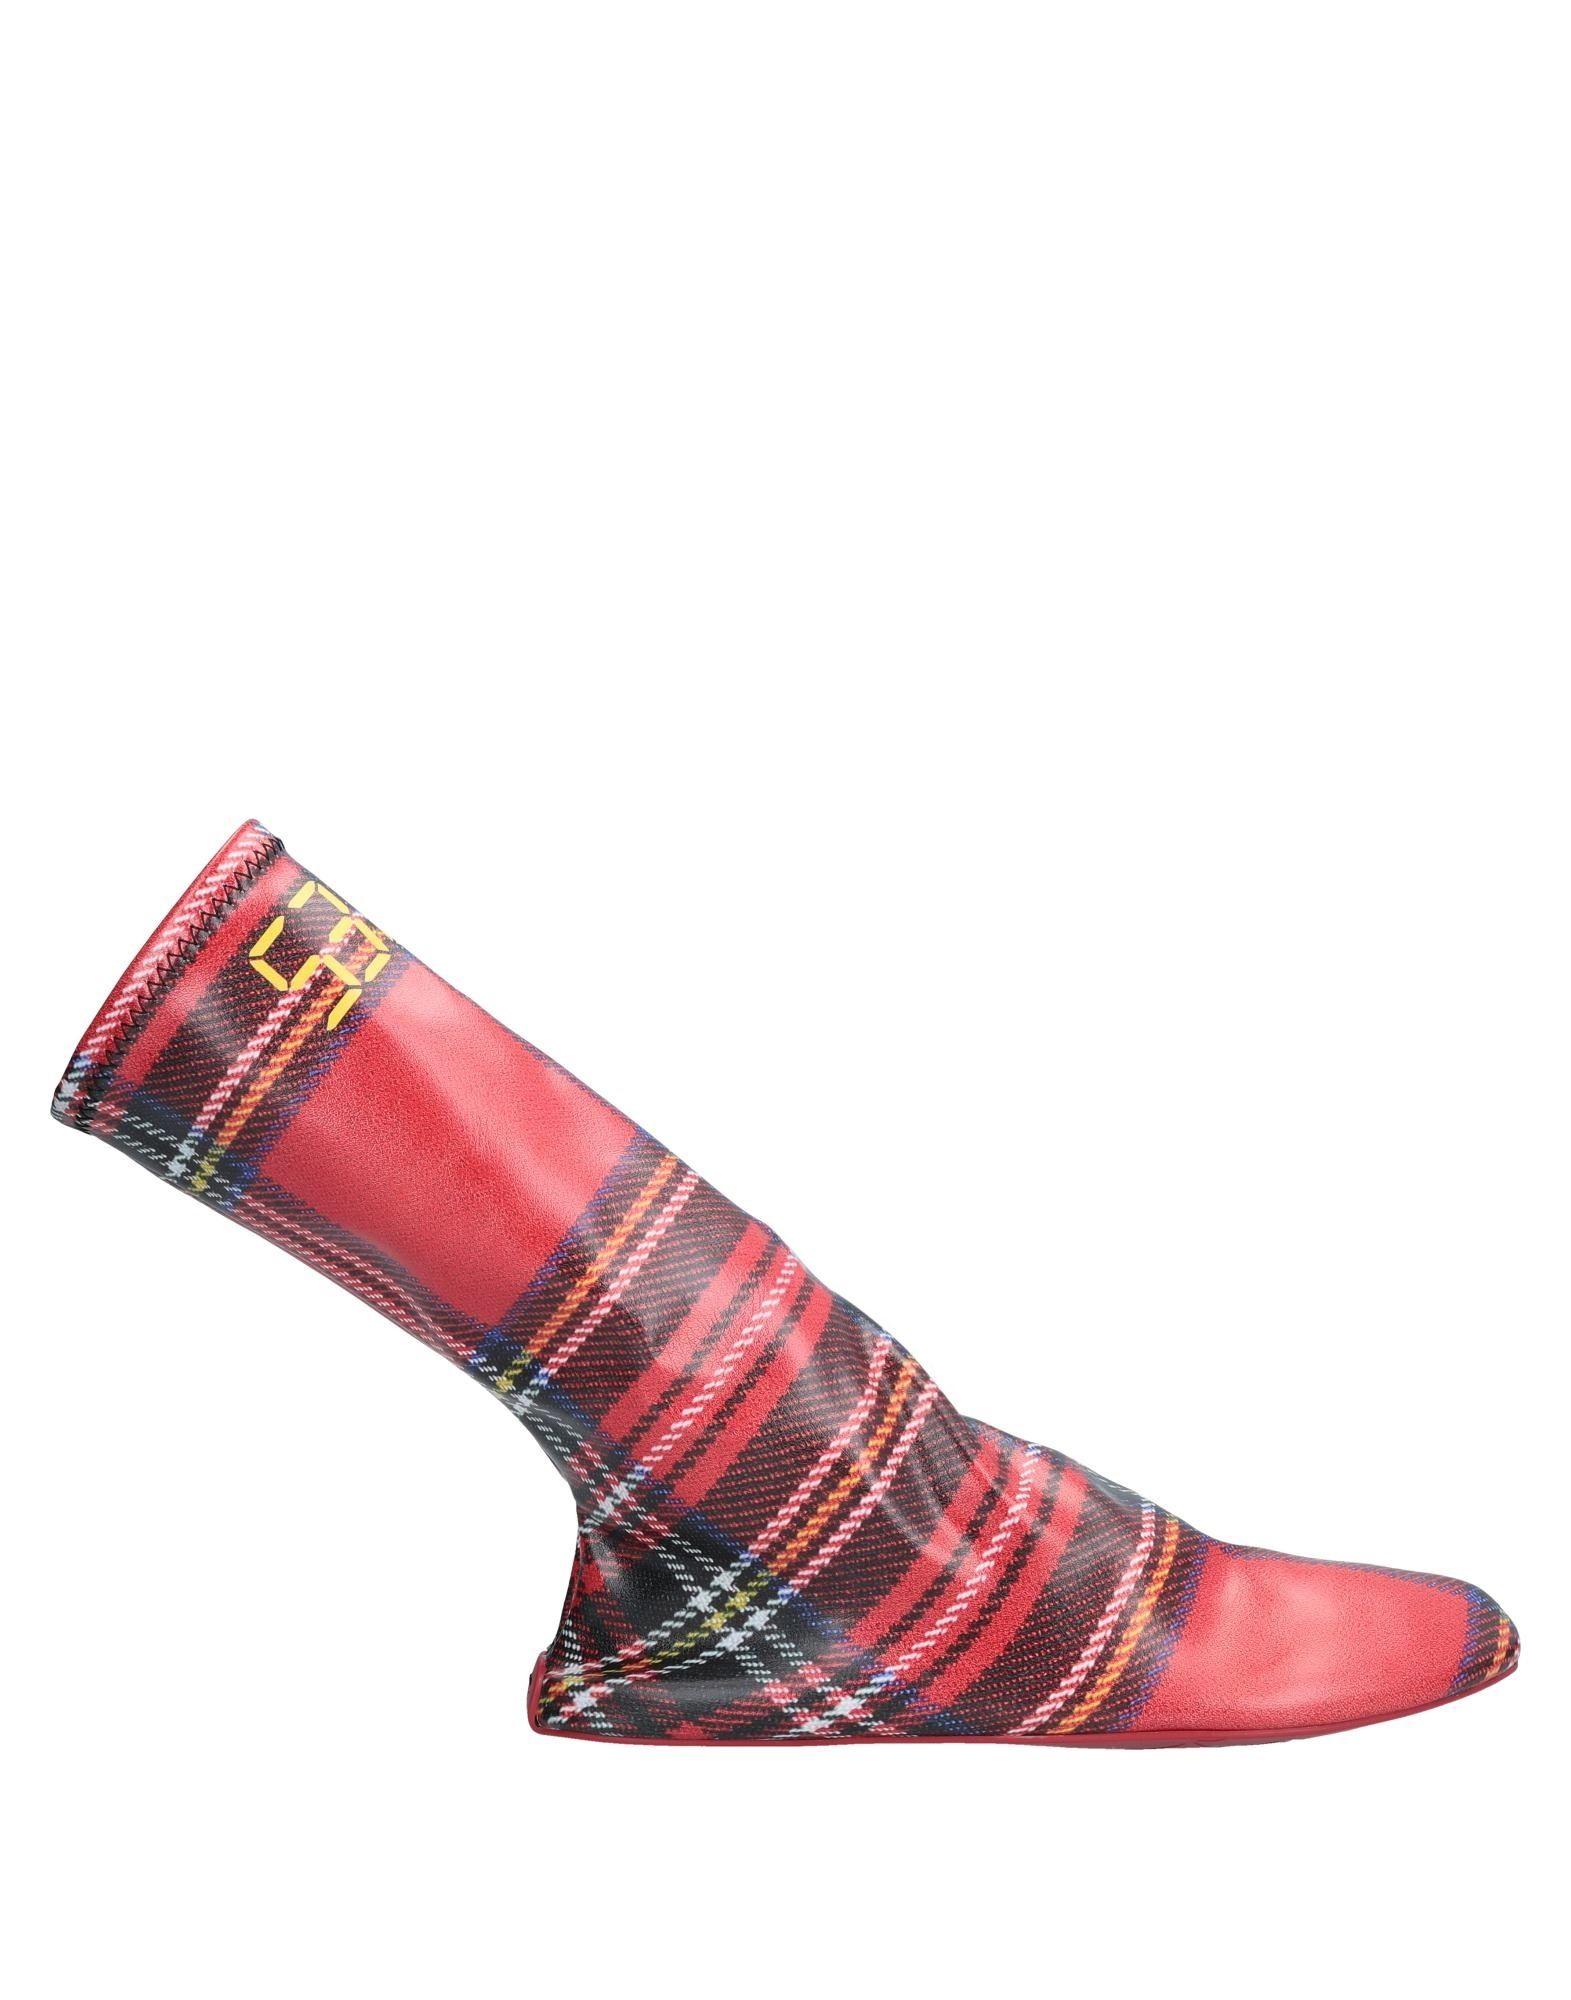 53045 SHOES Полусапоги и высокие ботинки ботинки swims ботинки без каблука